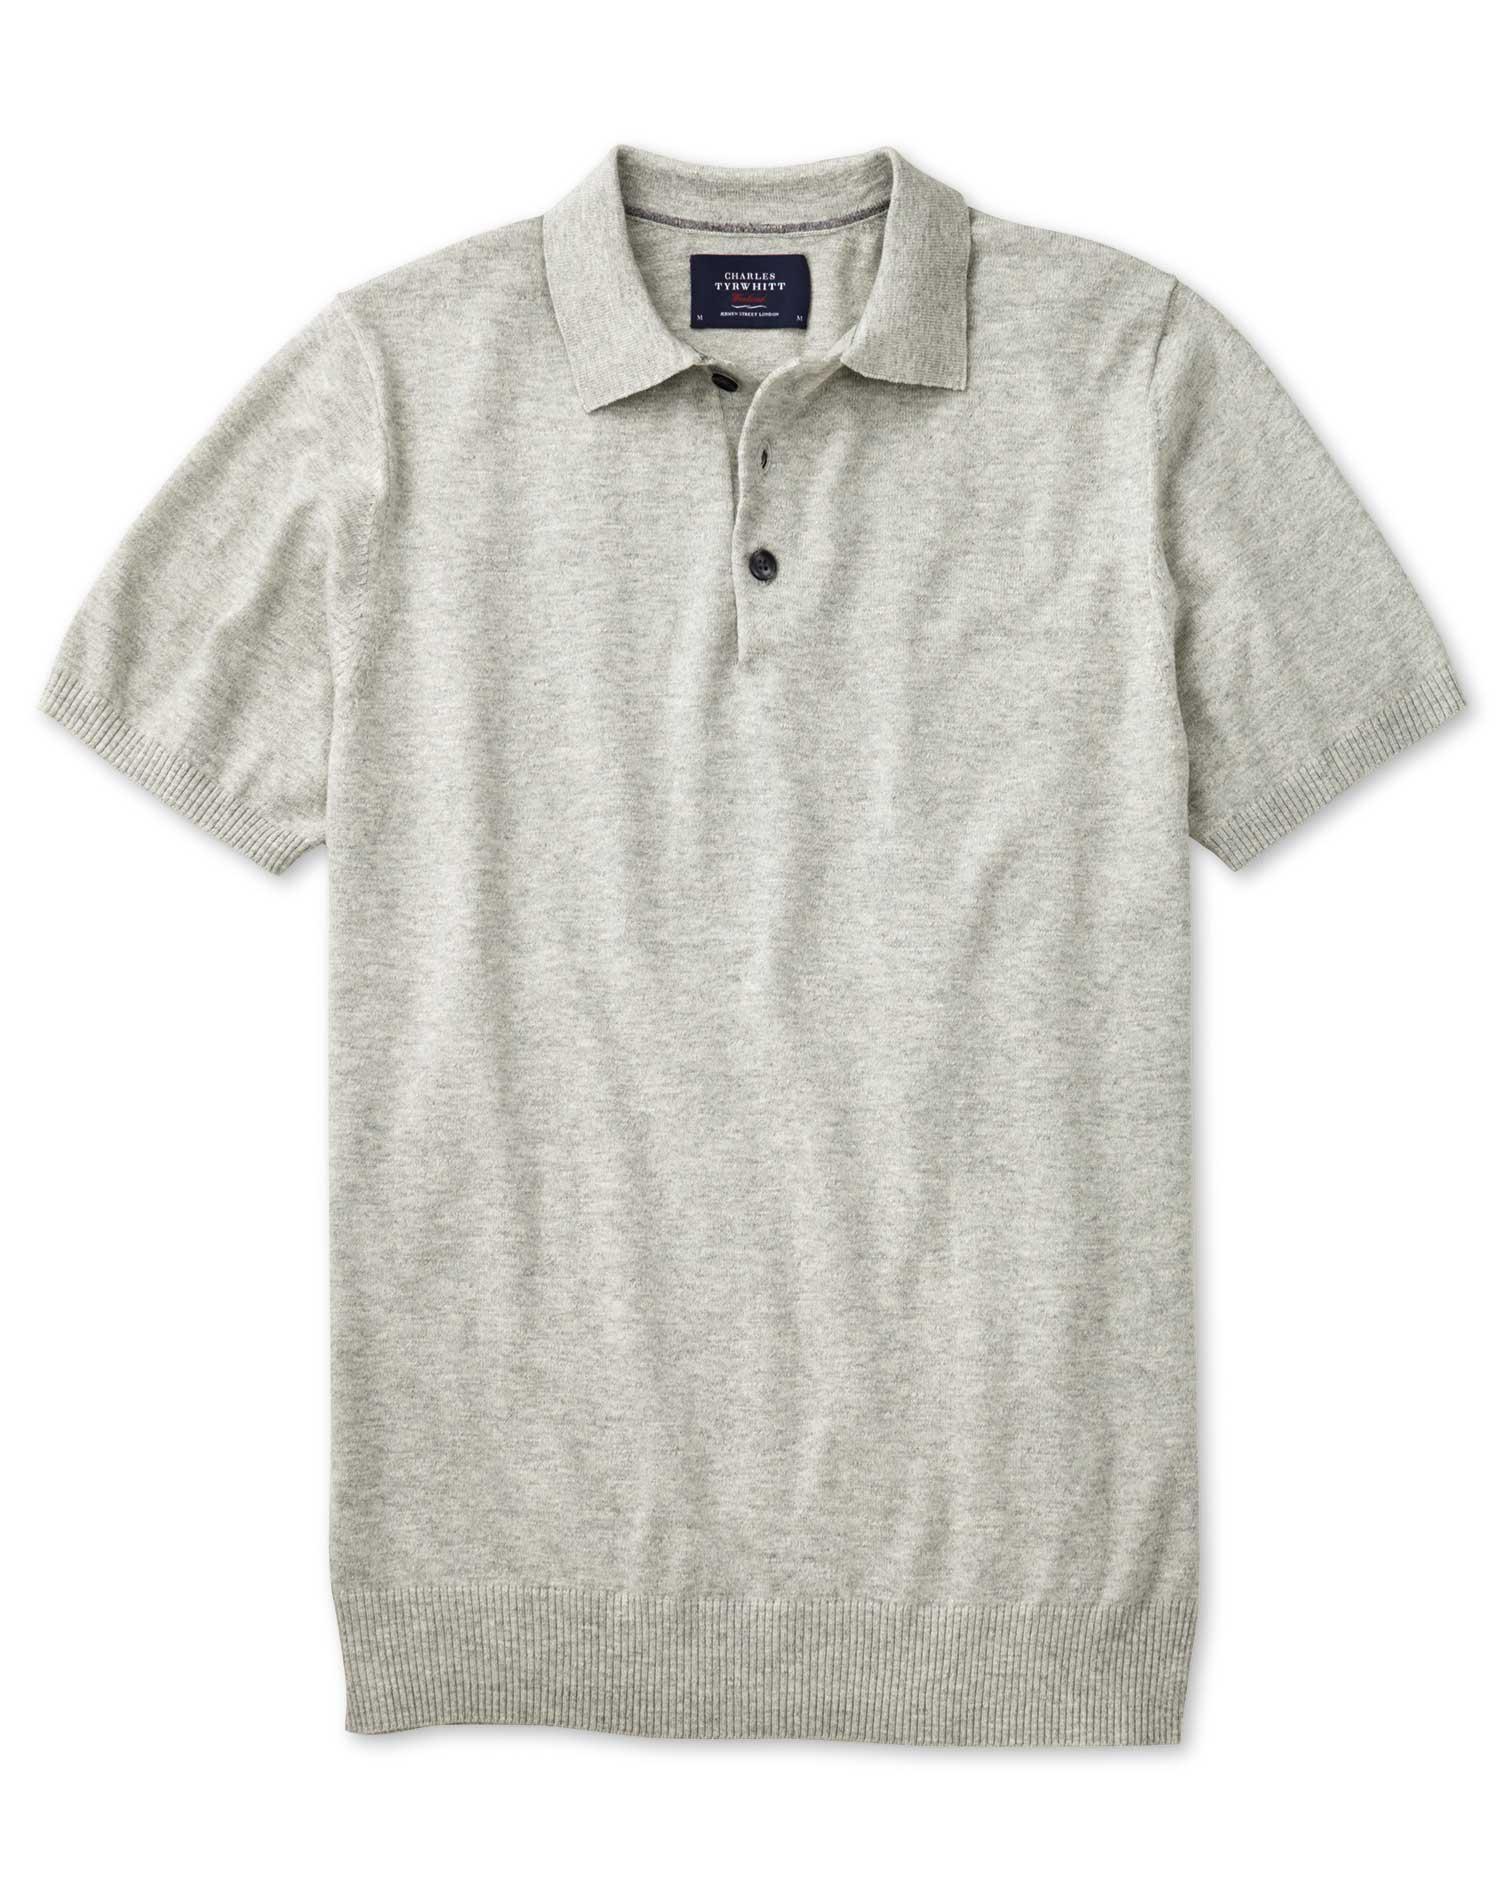 Silver Heather Short Sleeve Cotton Polo Collar Cotton Jumper Size XXL by Charles Tyrwhitt